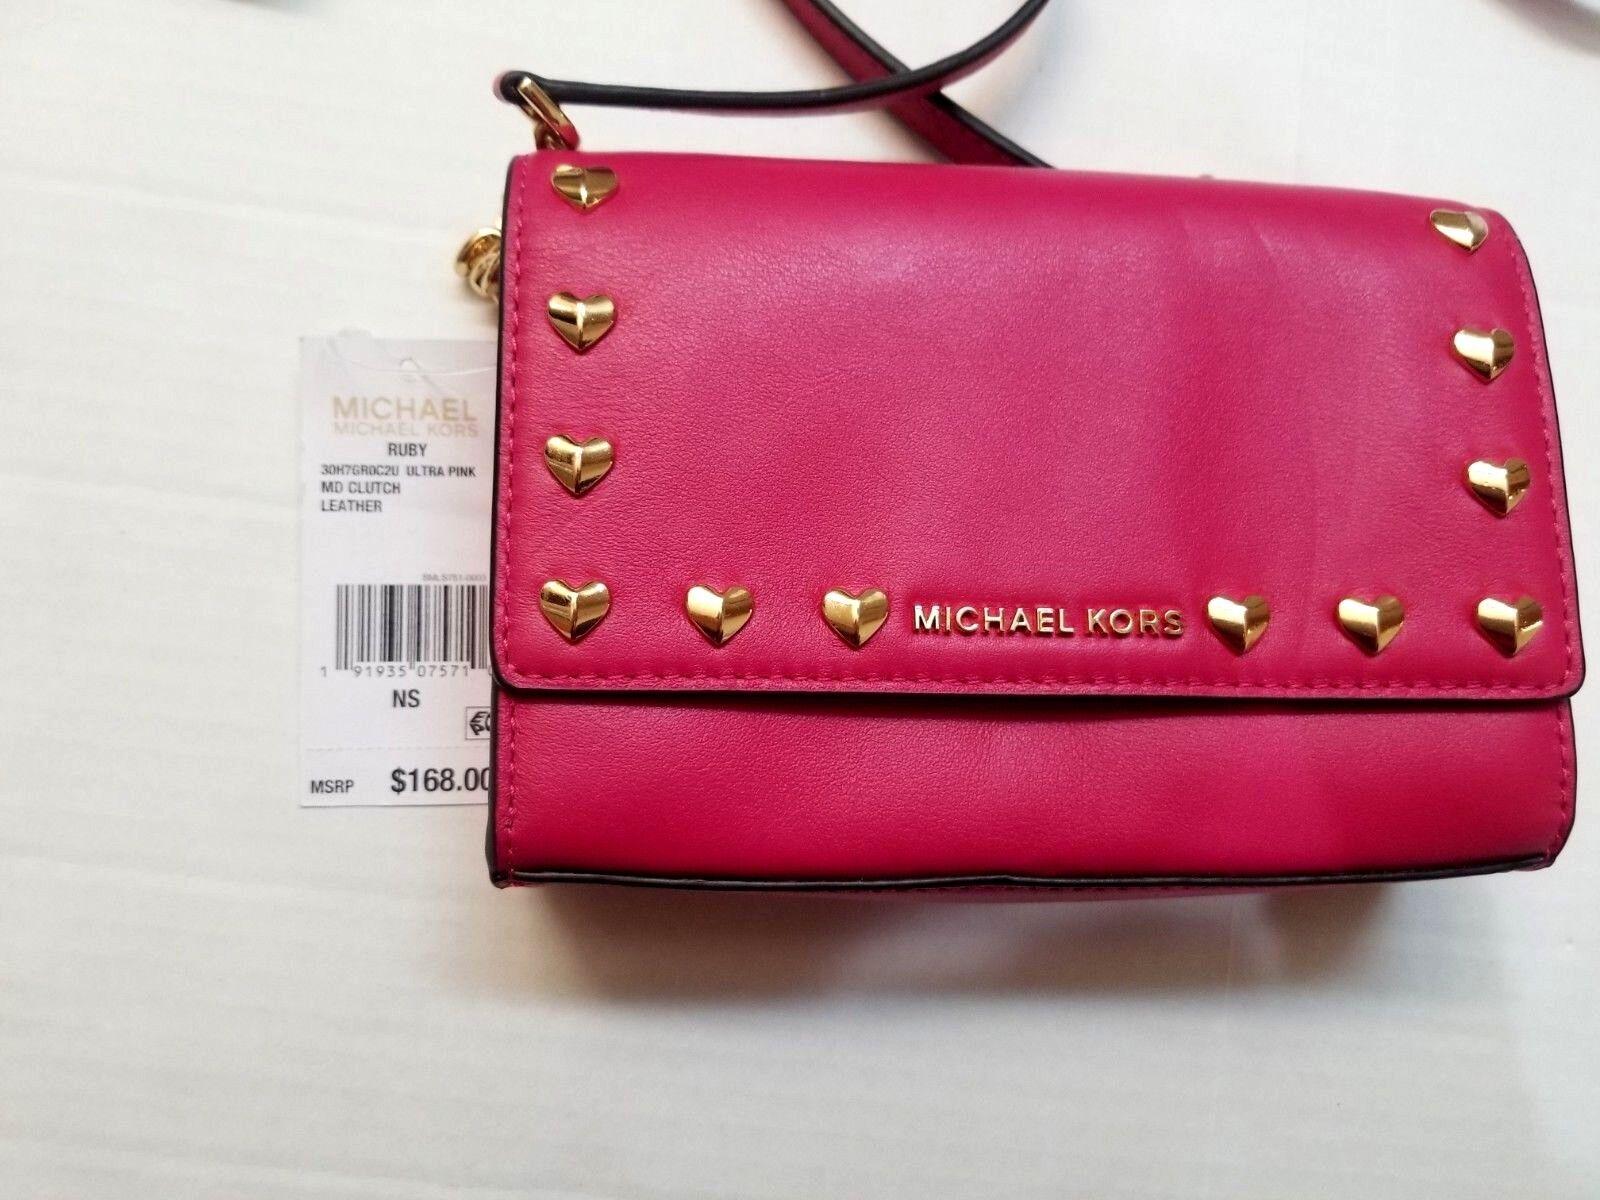 172ed7329047 Michael Kors Ruby Heart Stud Clutch Crossbody Bag Ultra Pink 30h7gr0c2u for  sale online